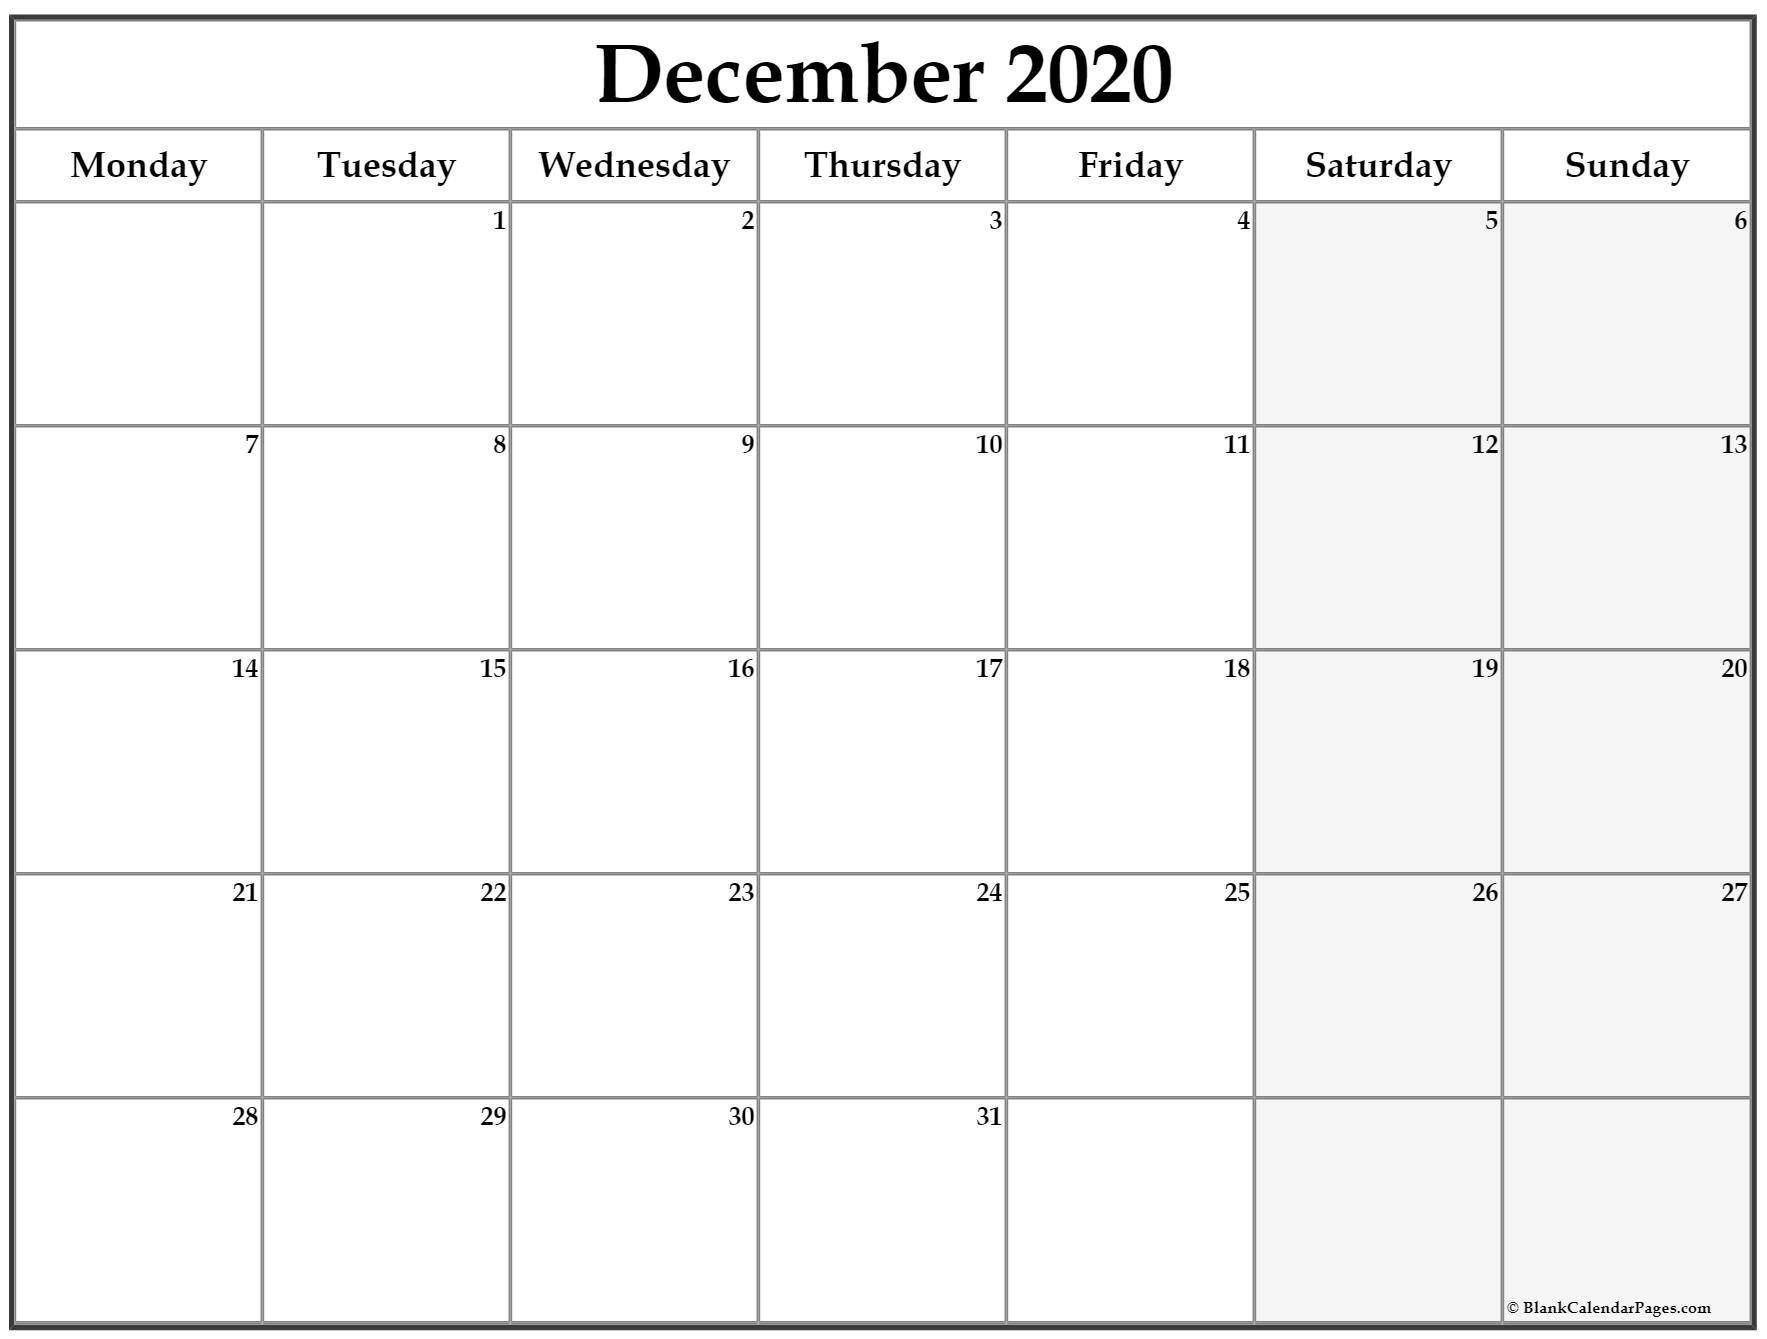 December 2020 Monday Calendar   Monday To Sunday Monday Through Sunday Planner